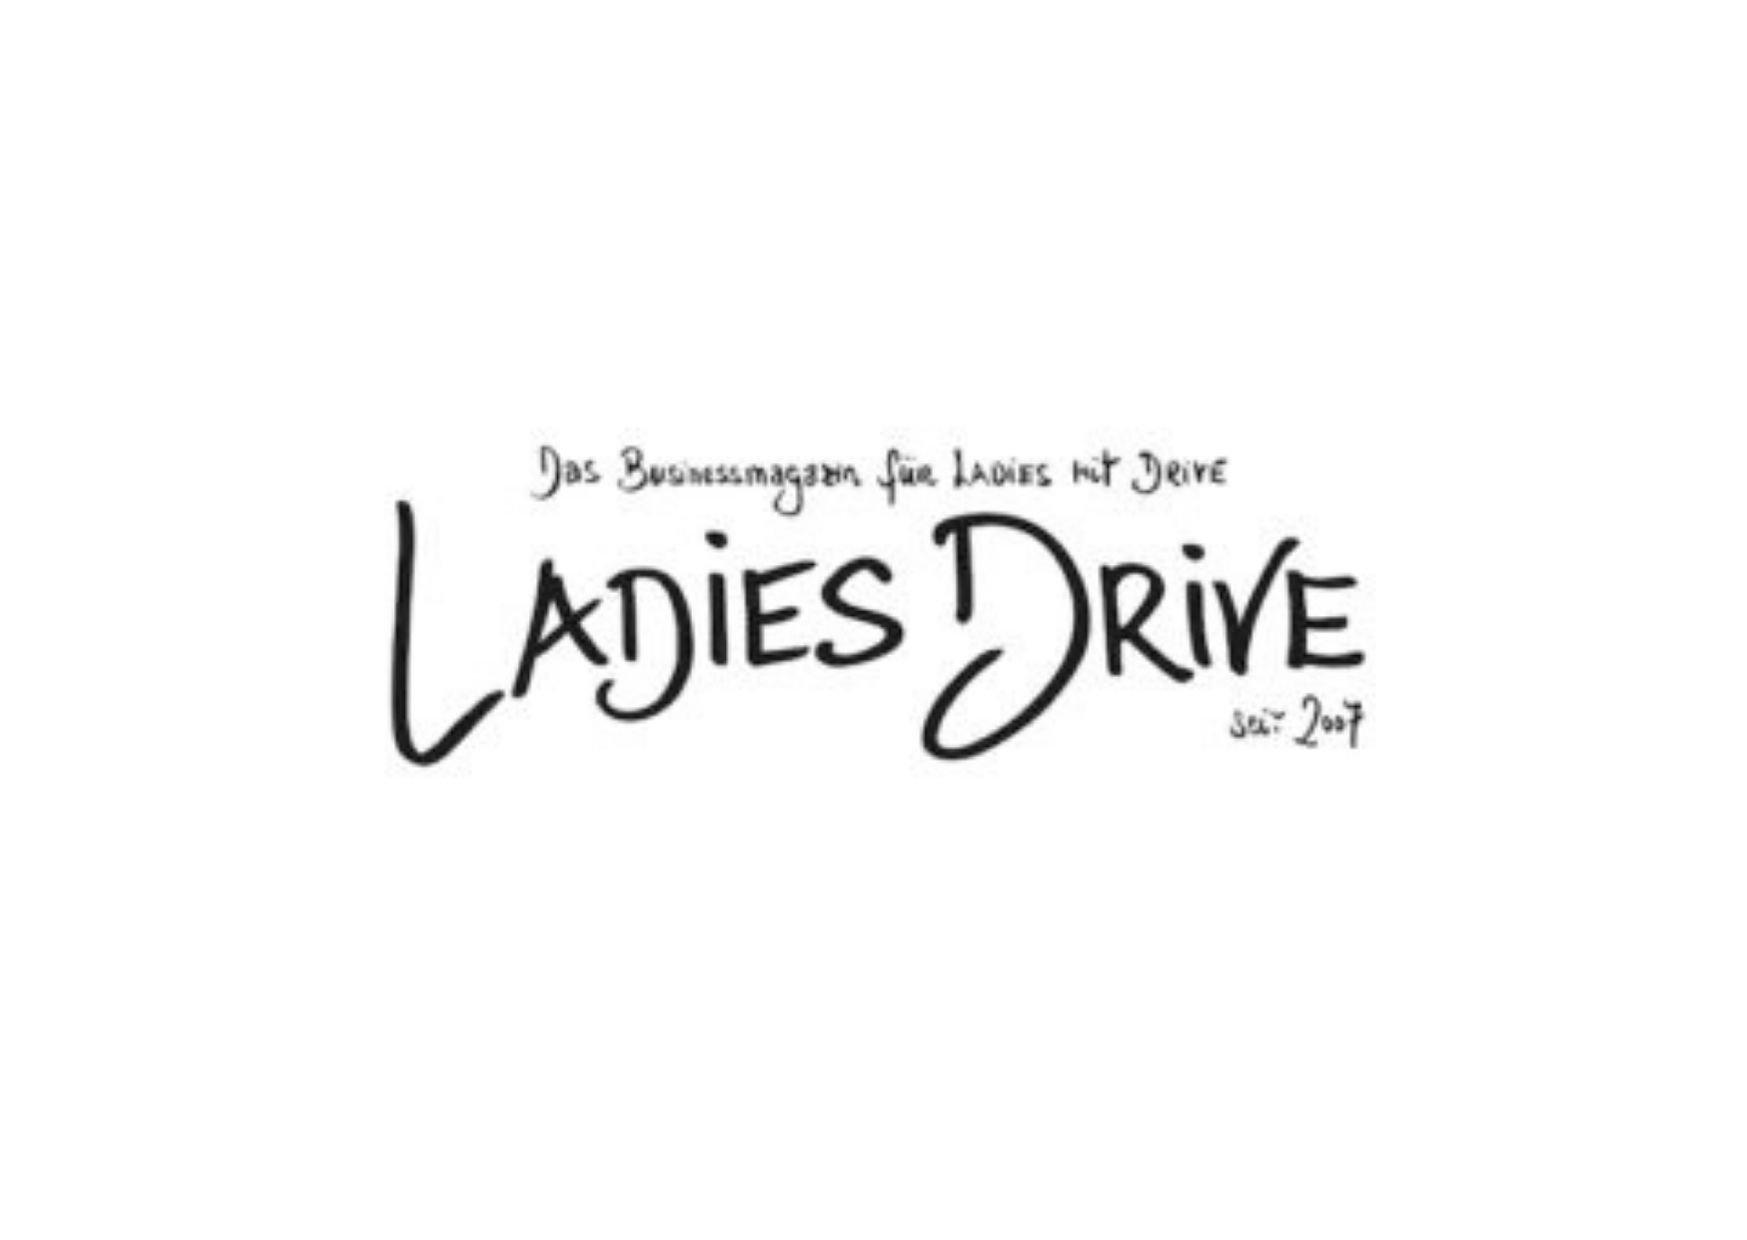 Noreena's Interview for Swiss Ladies Drive